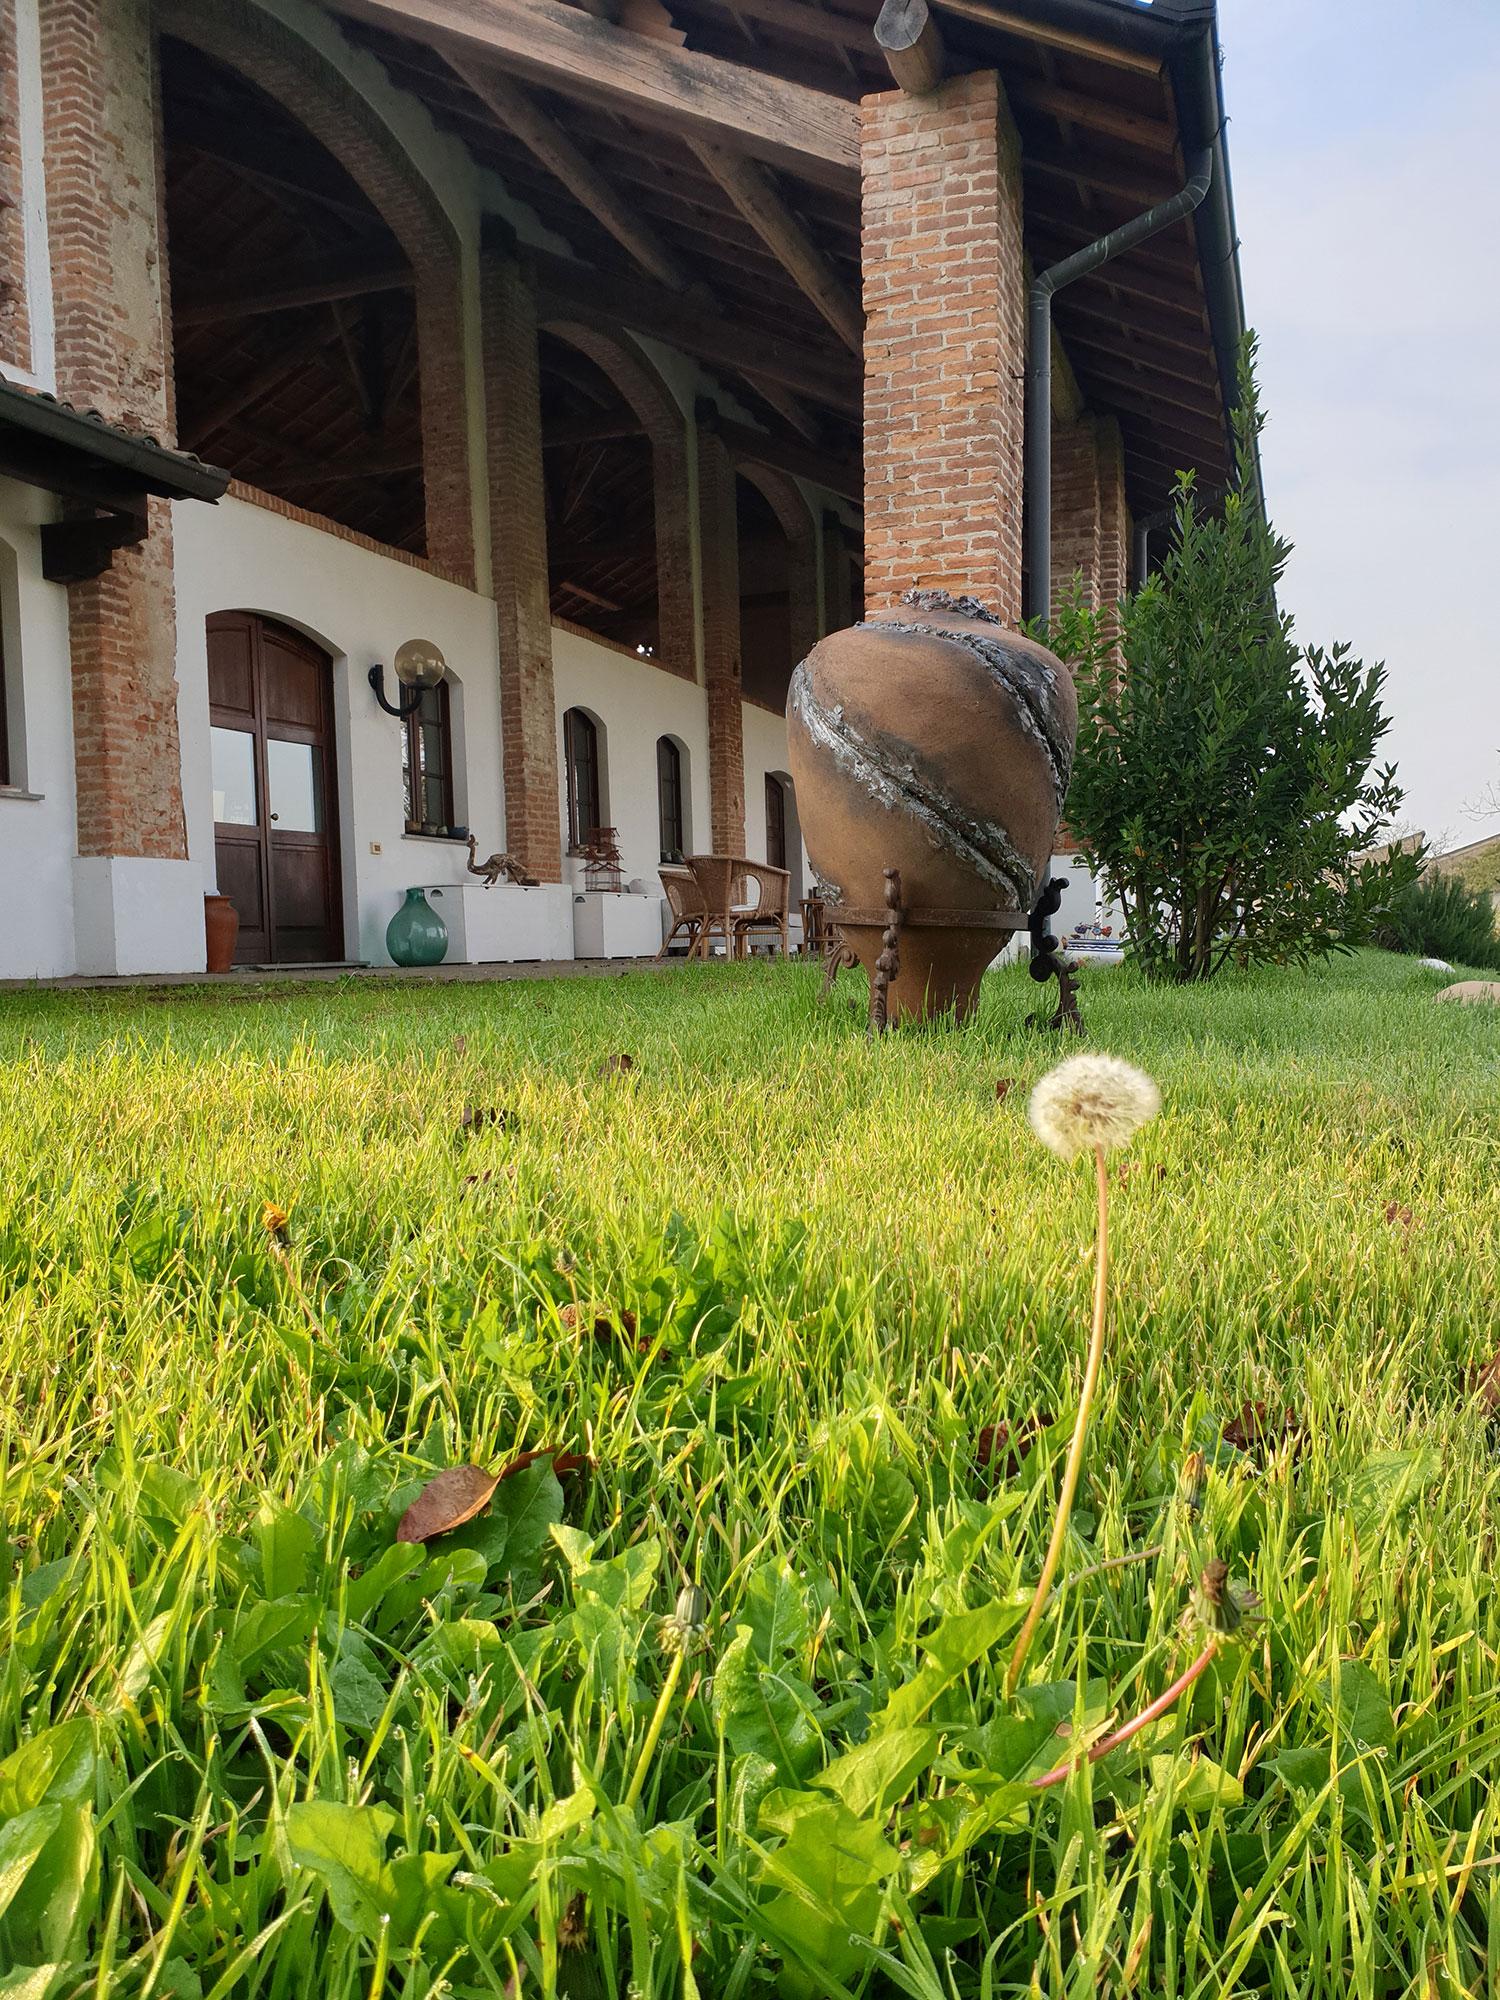 Giardino di Cascina Orologio a Pavia